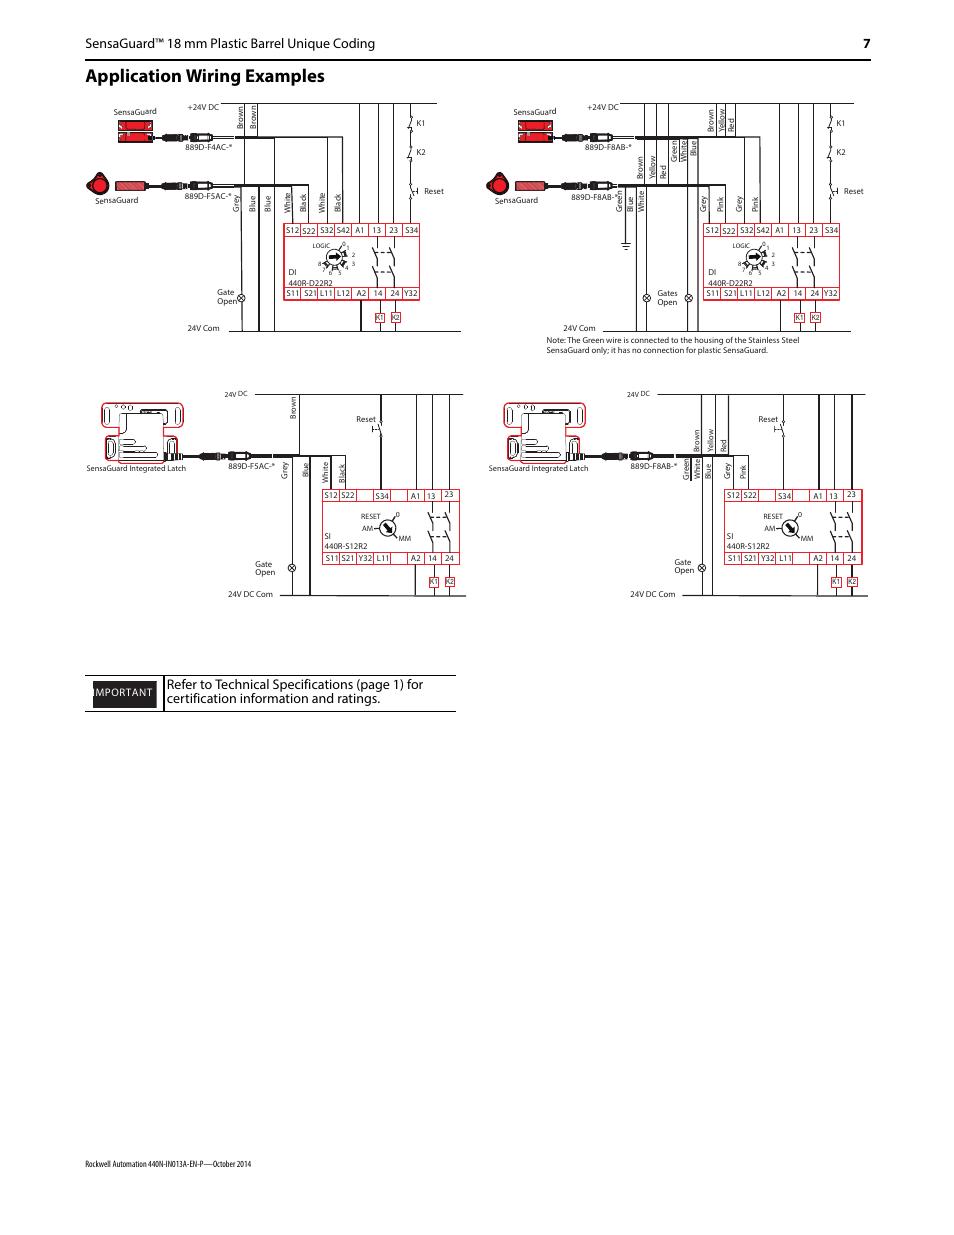 Emergency stop wiring diagram wiring diagram with jzgreentown yamaha emergency stop switch wiring diagram wiring cheapraybanclubmaster Choice Image